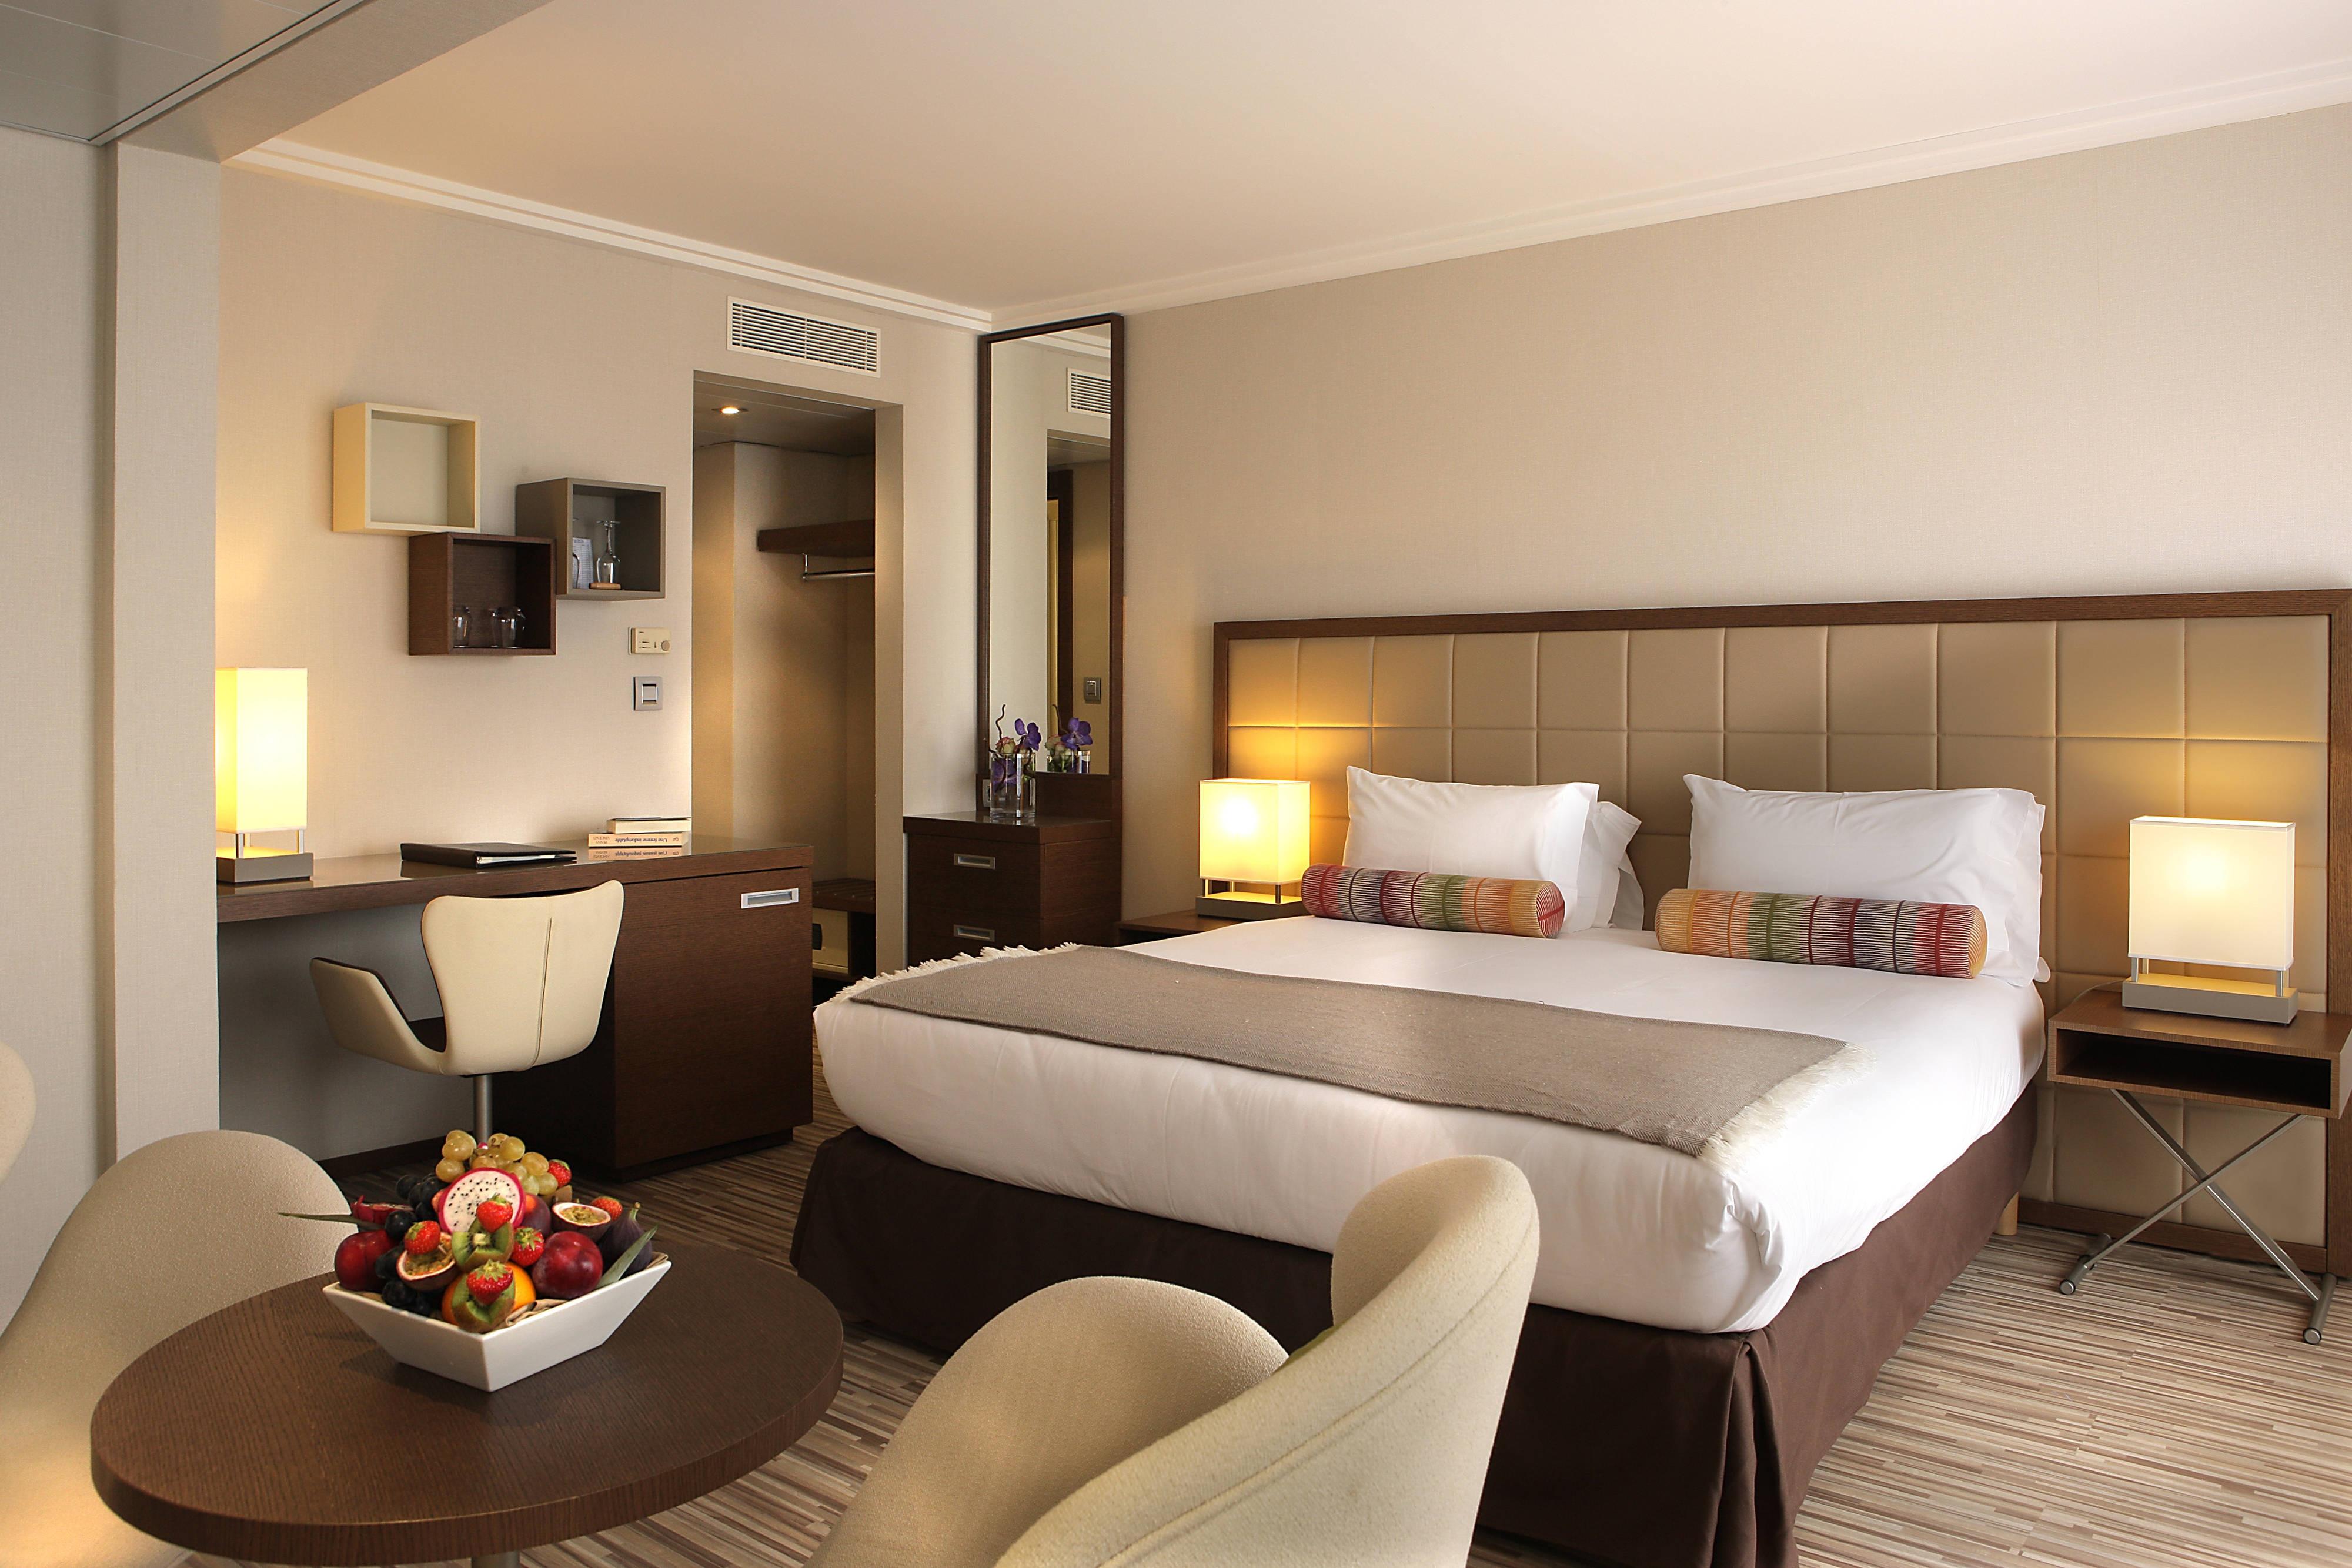 luxury hotels suites in Antibes